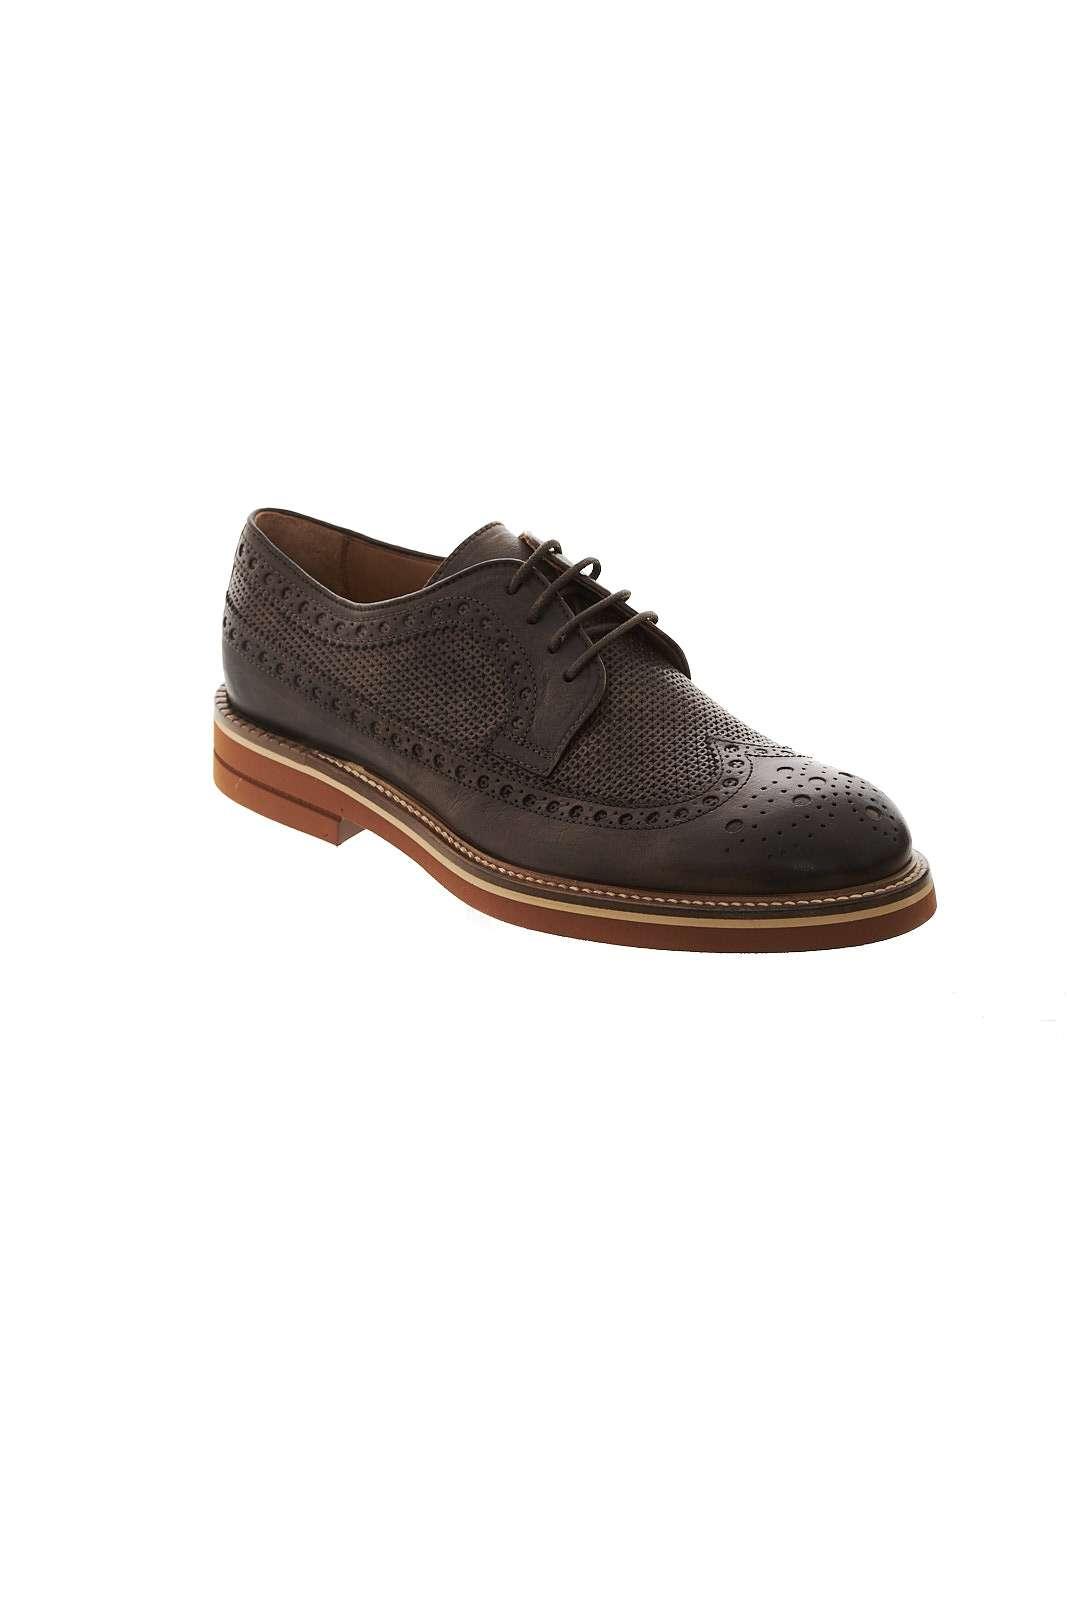 PE-outlet_parmax-scarpe-uomo-Corvari-8082